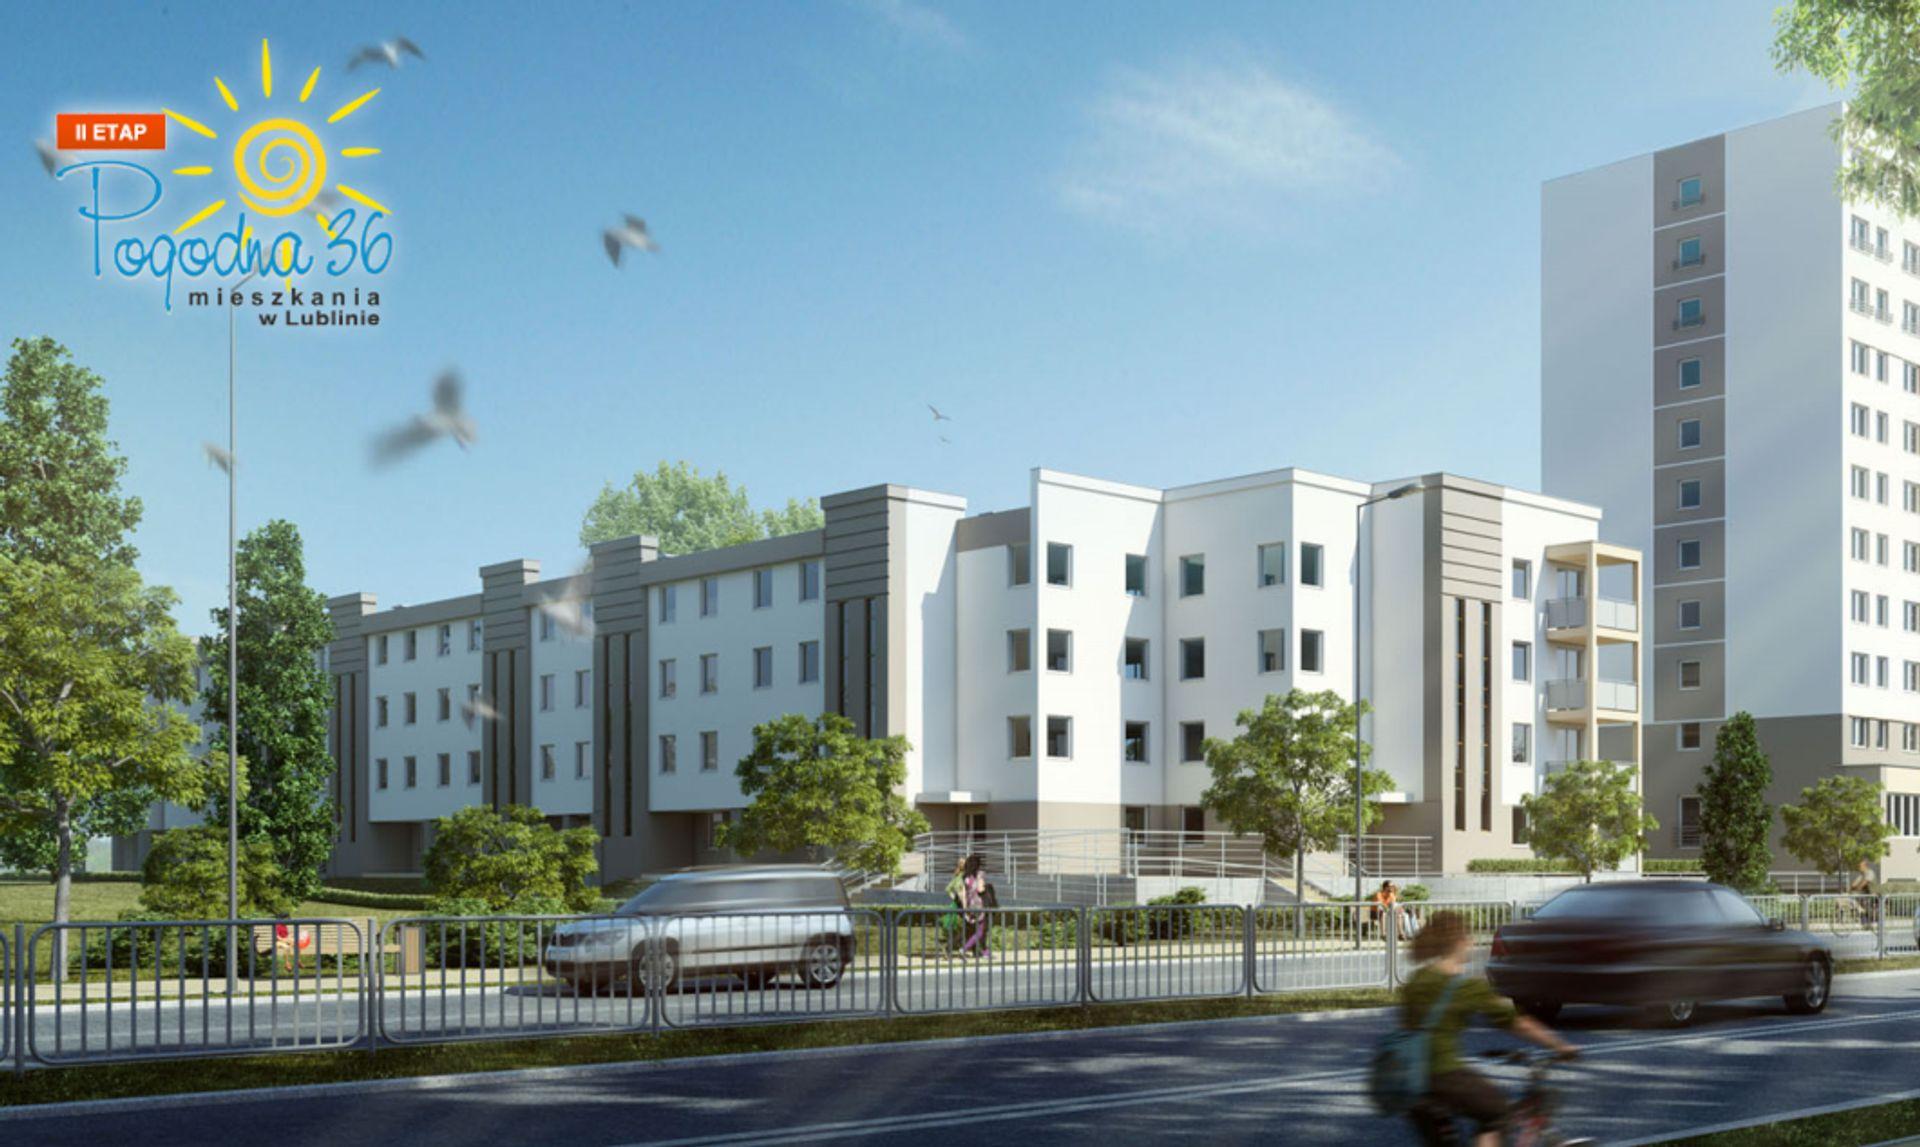 [Lublin] Mieszkania dla Młodych na Pogodnej 36